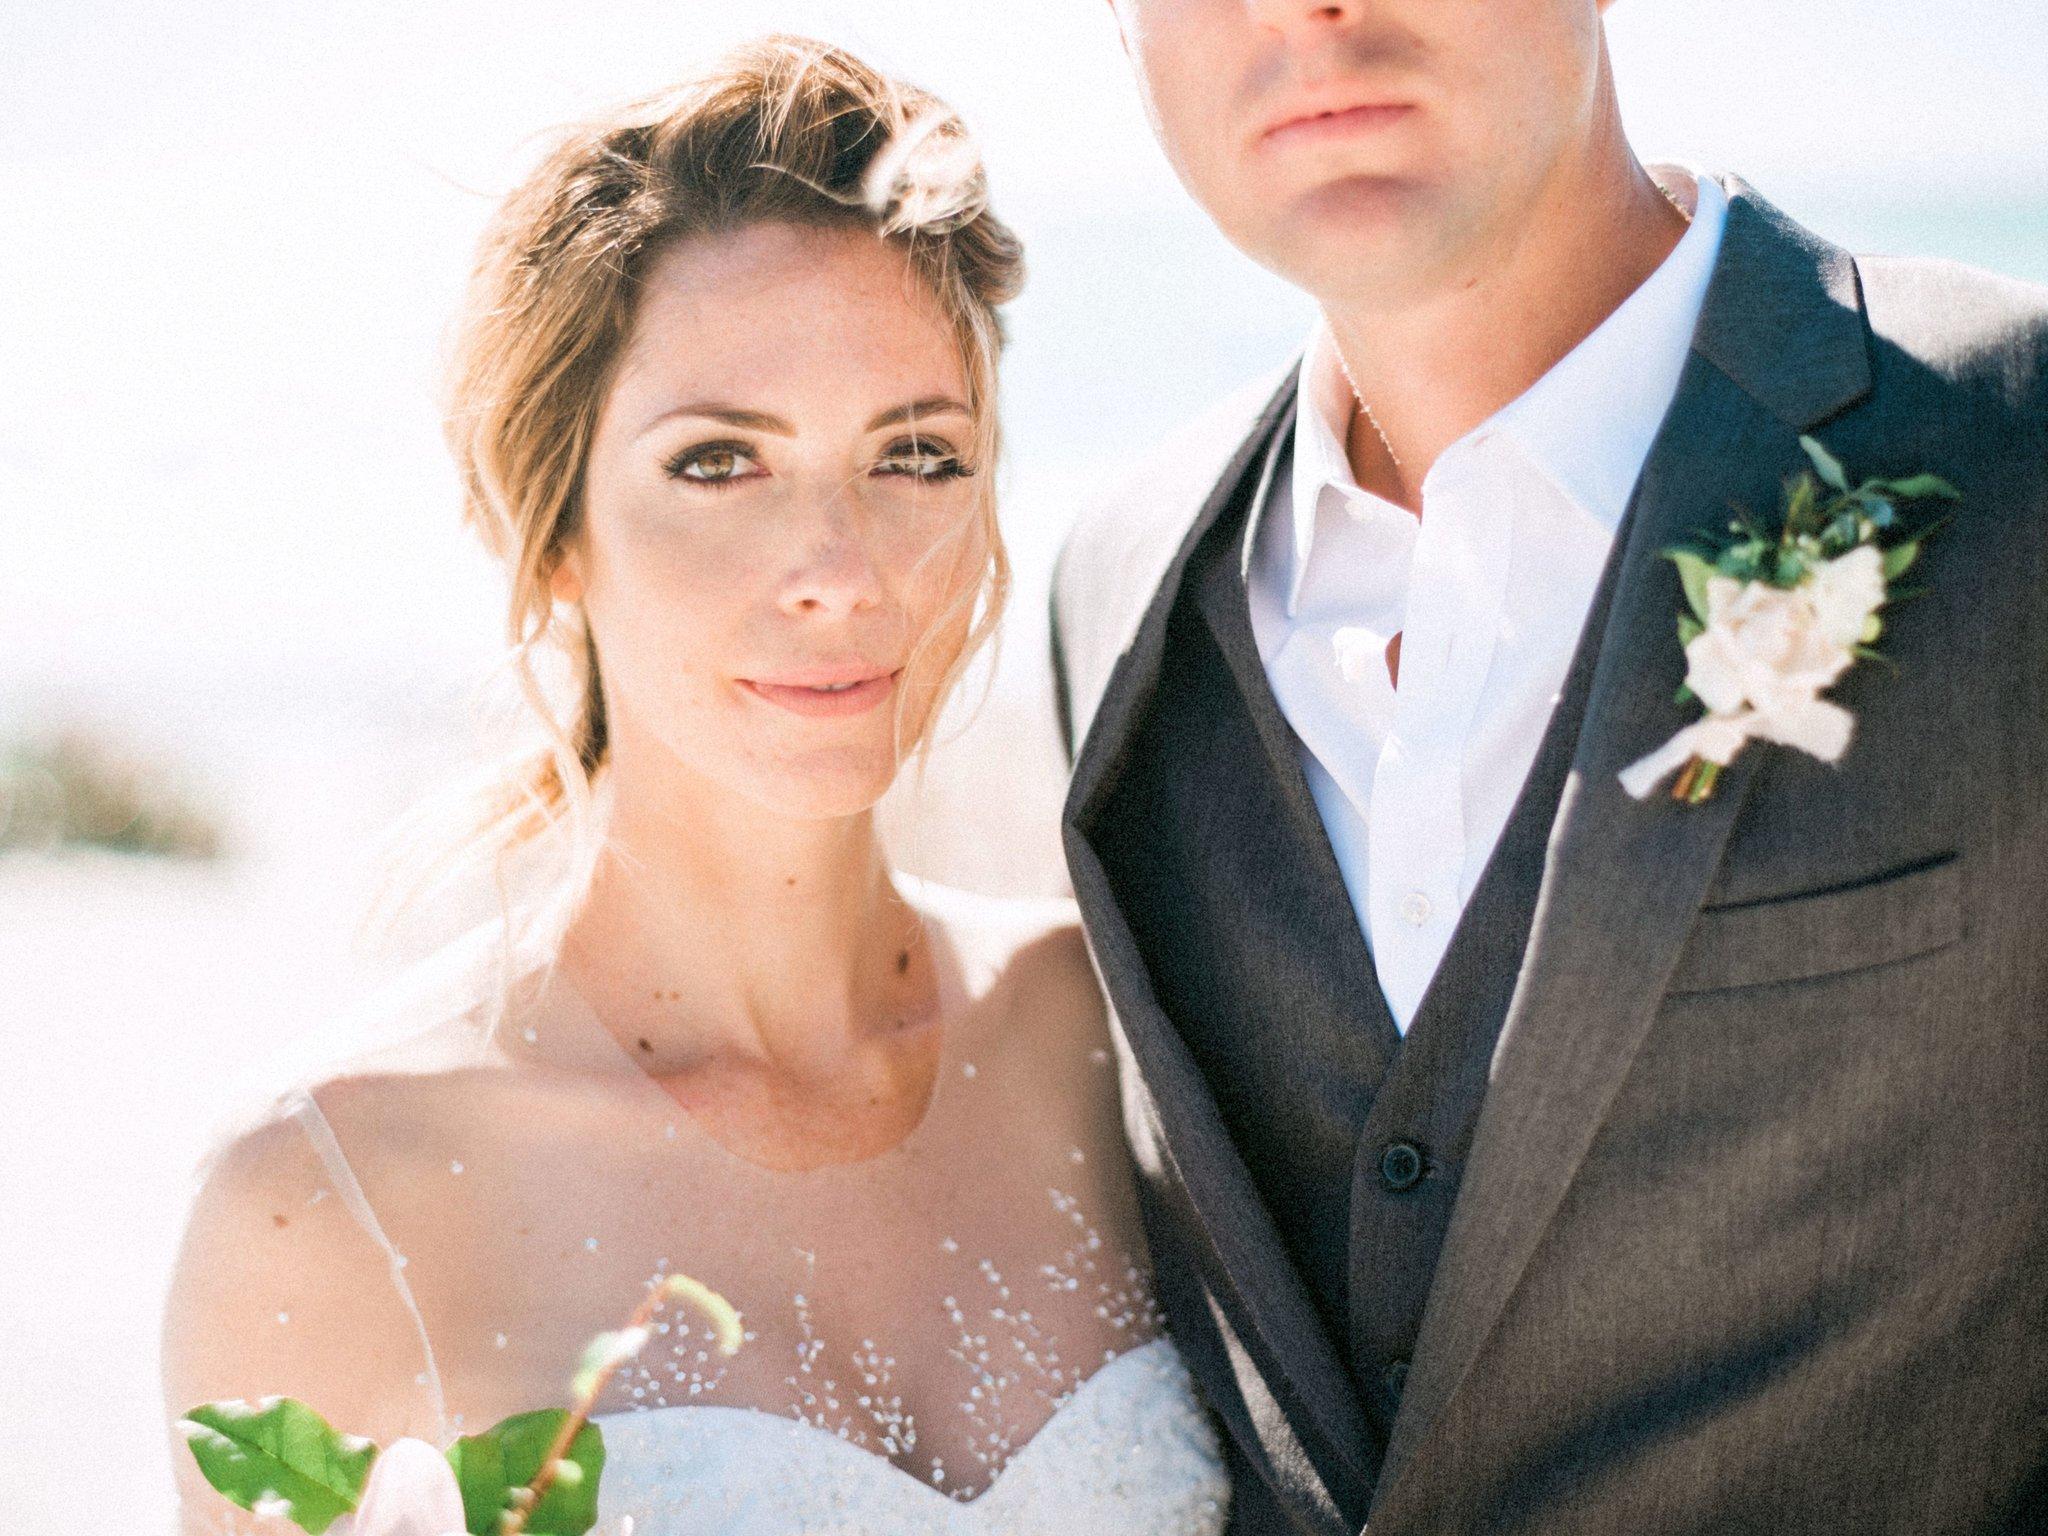 florida-beach-wedding-inspiration-6277.jpg